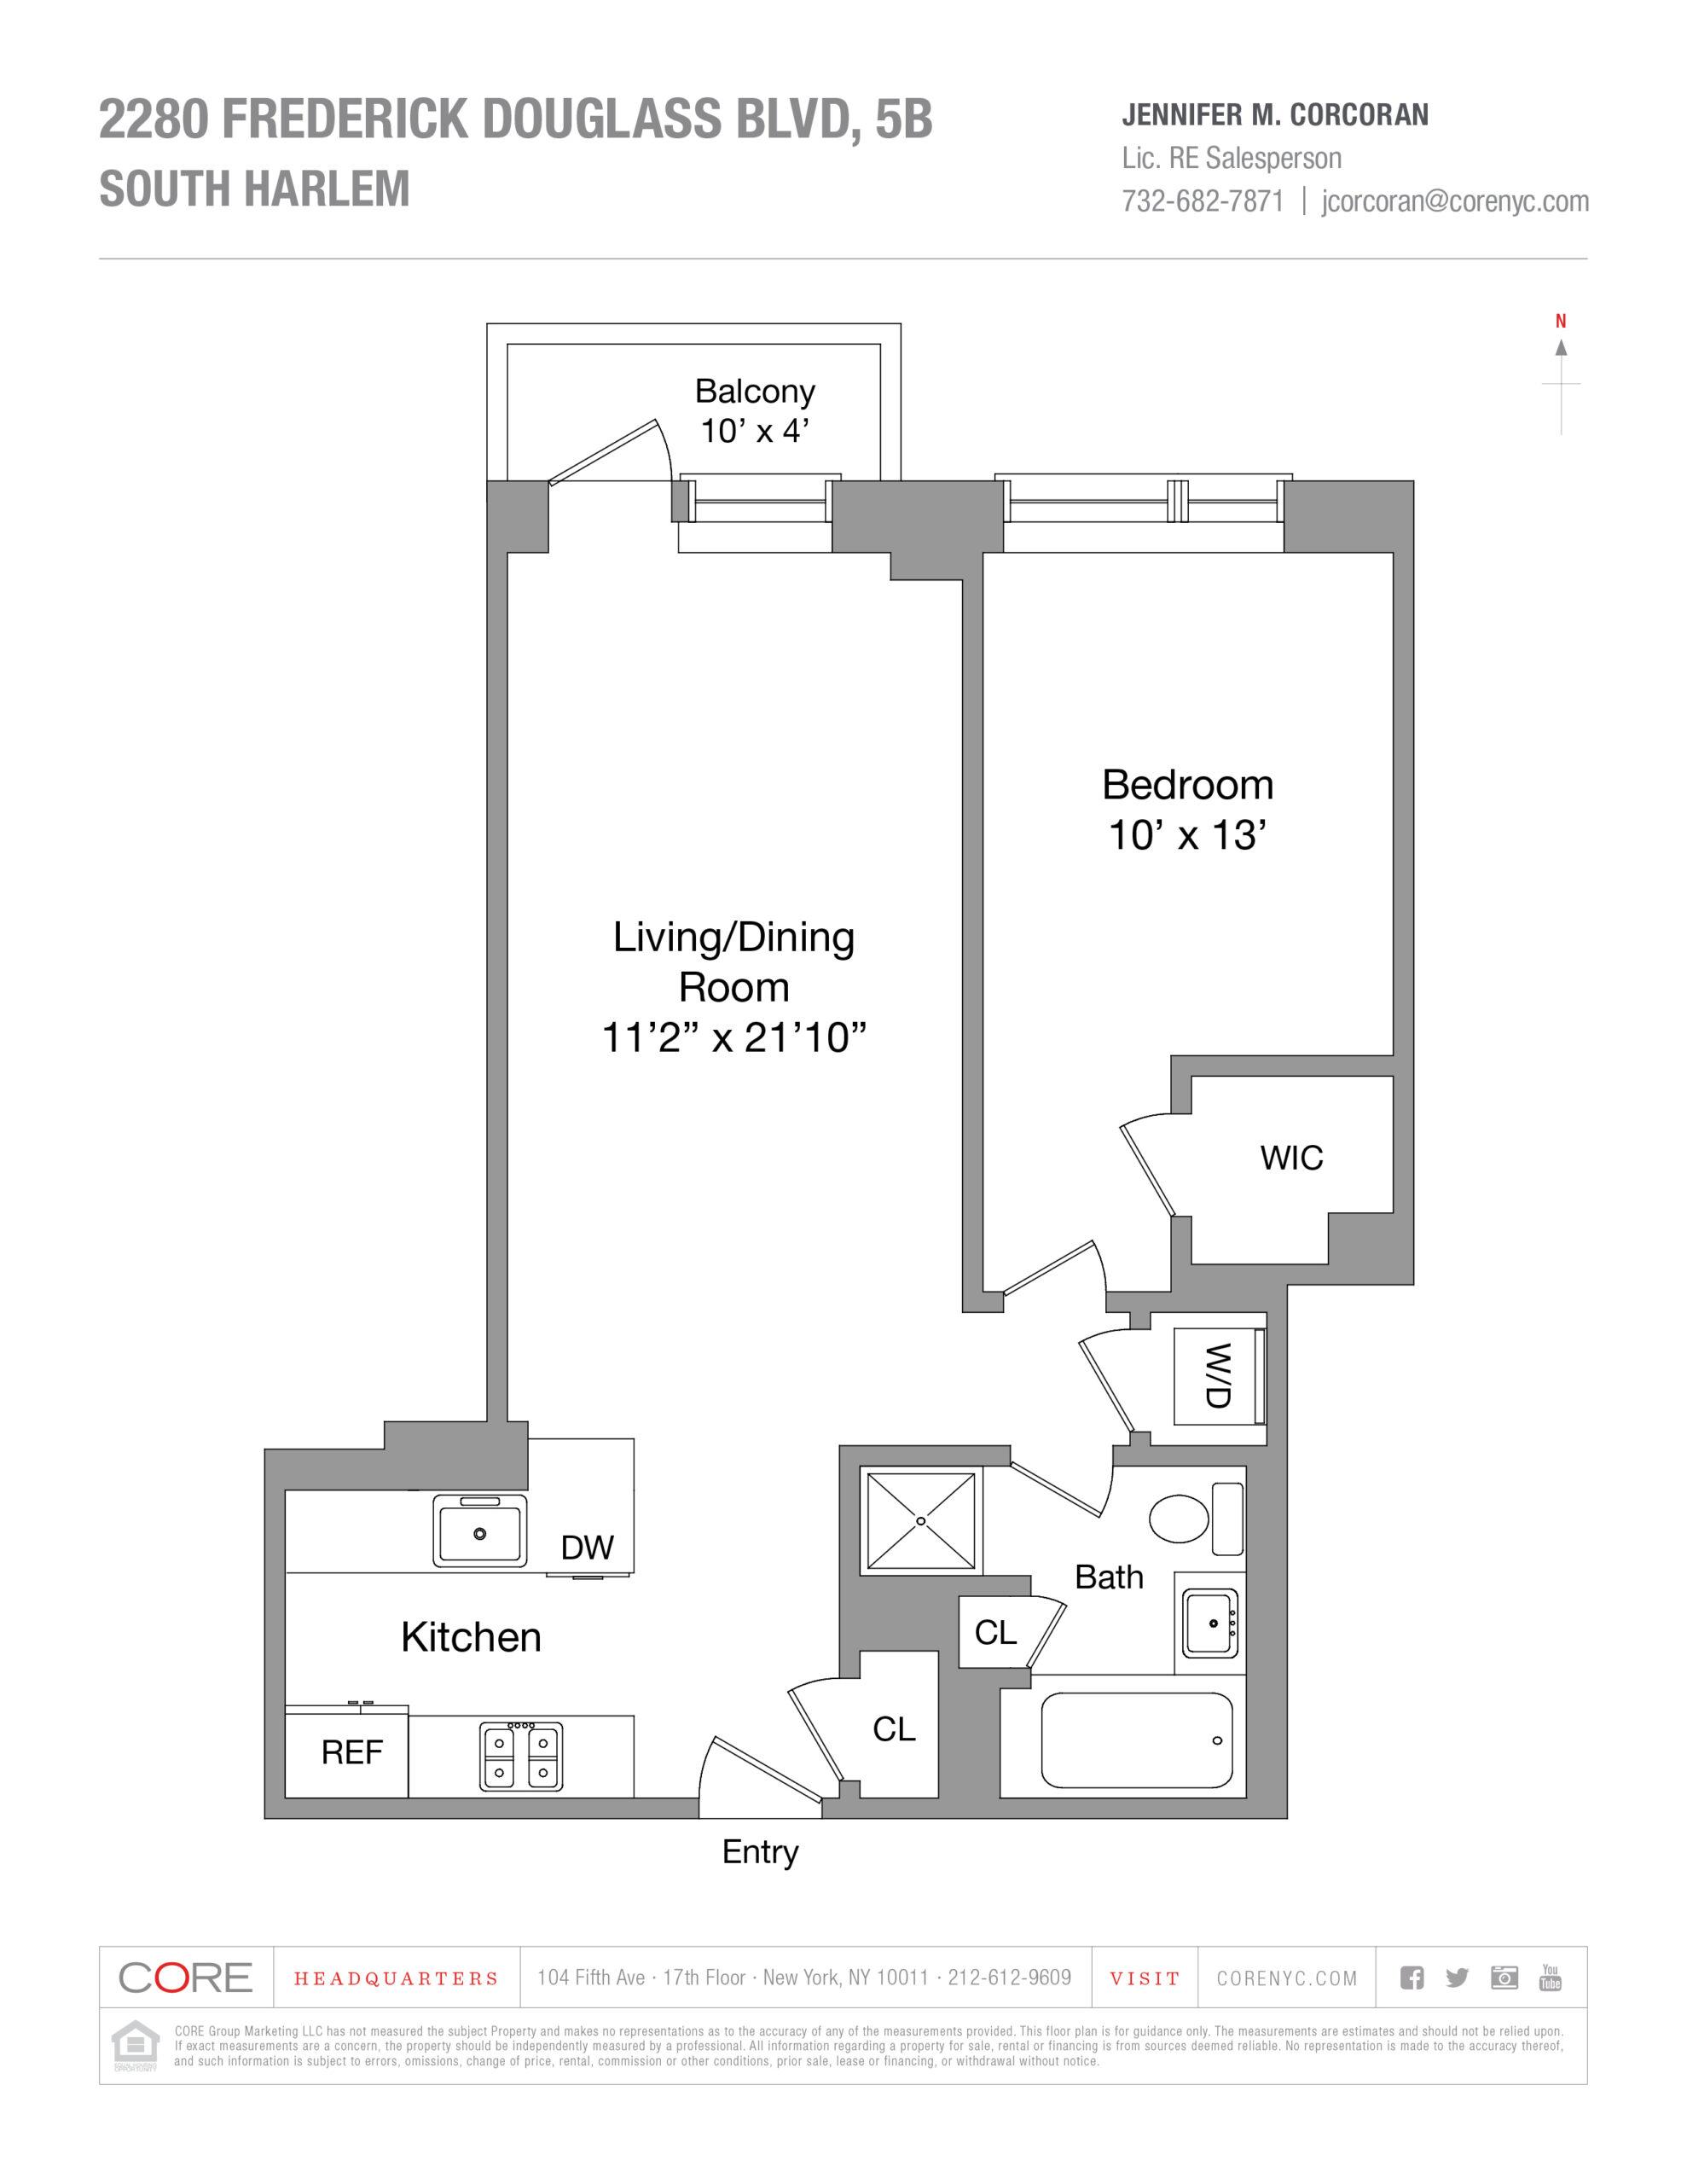 2280 Frederick Douglass Blvd. 5B, New York, NY 10027